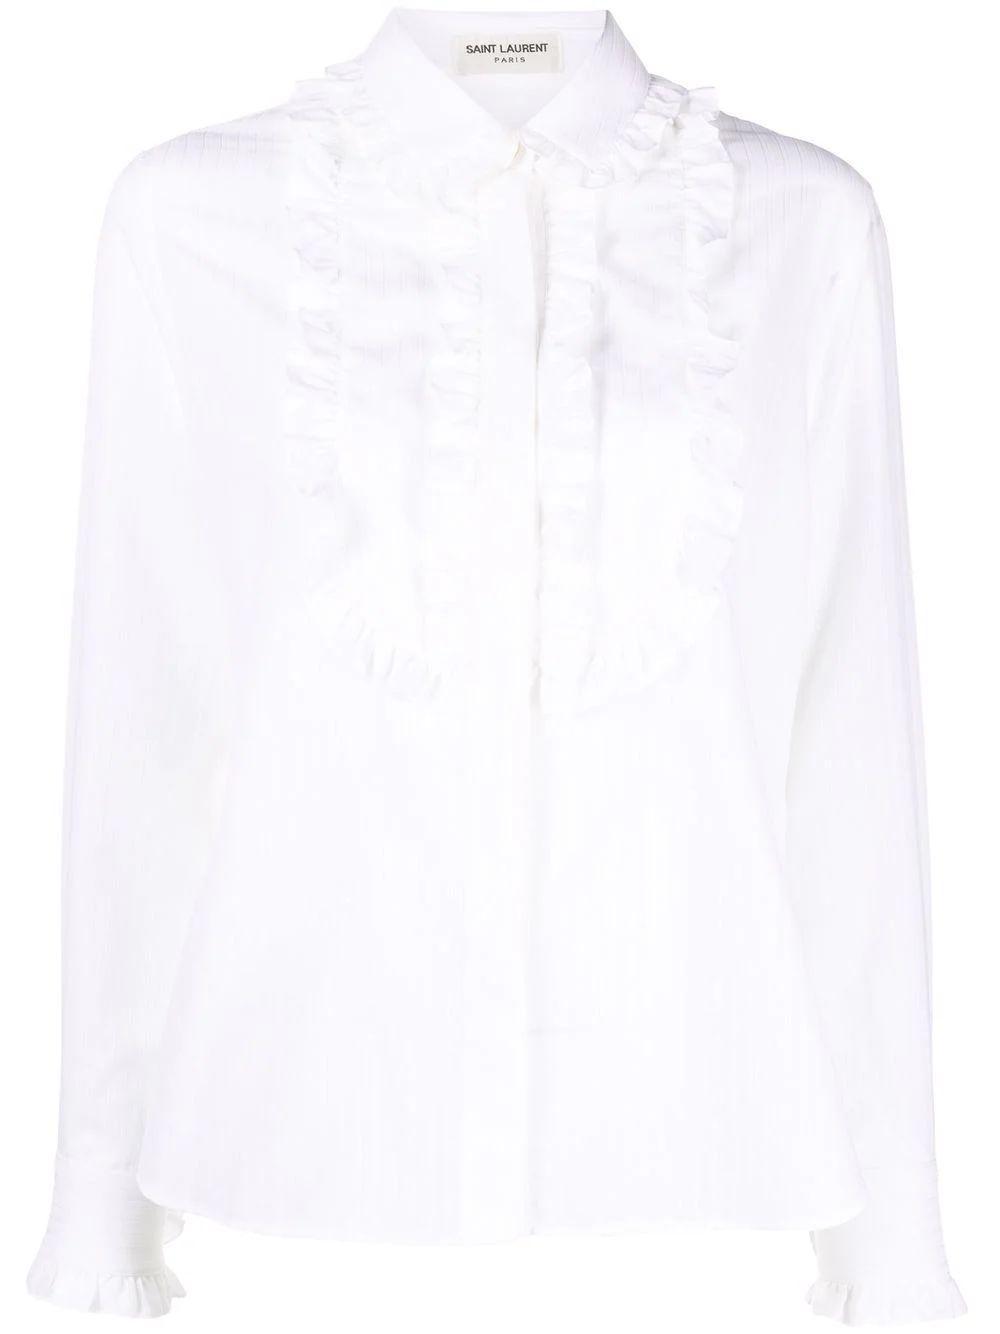 Classic Collared Shirt Item # 656972Y3D31